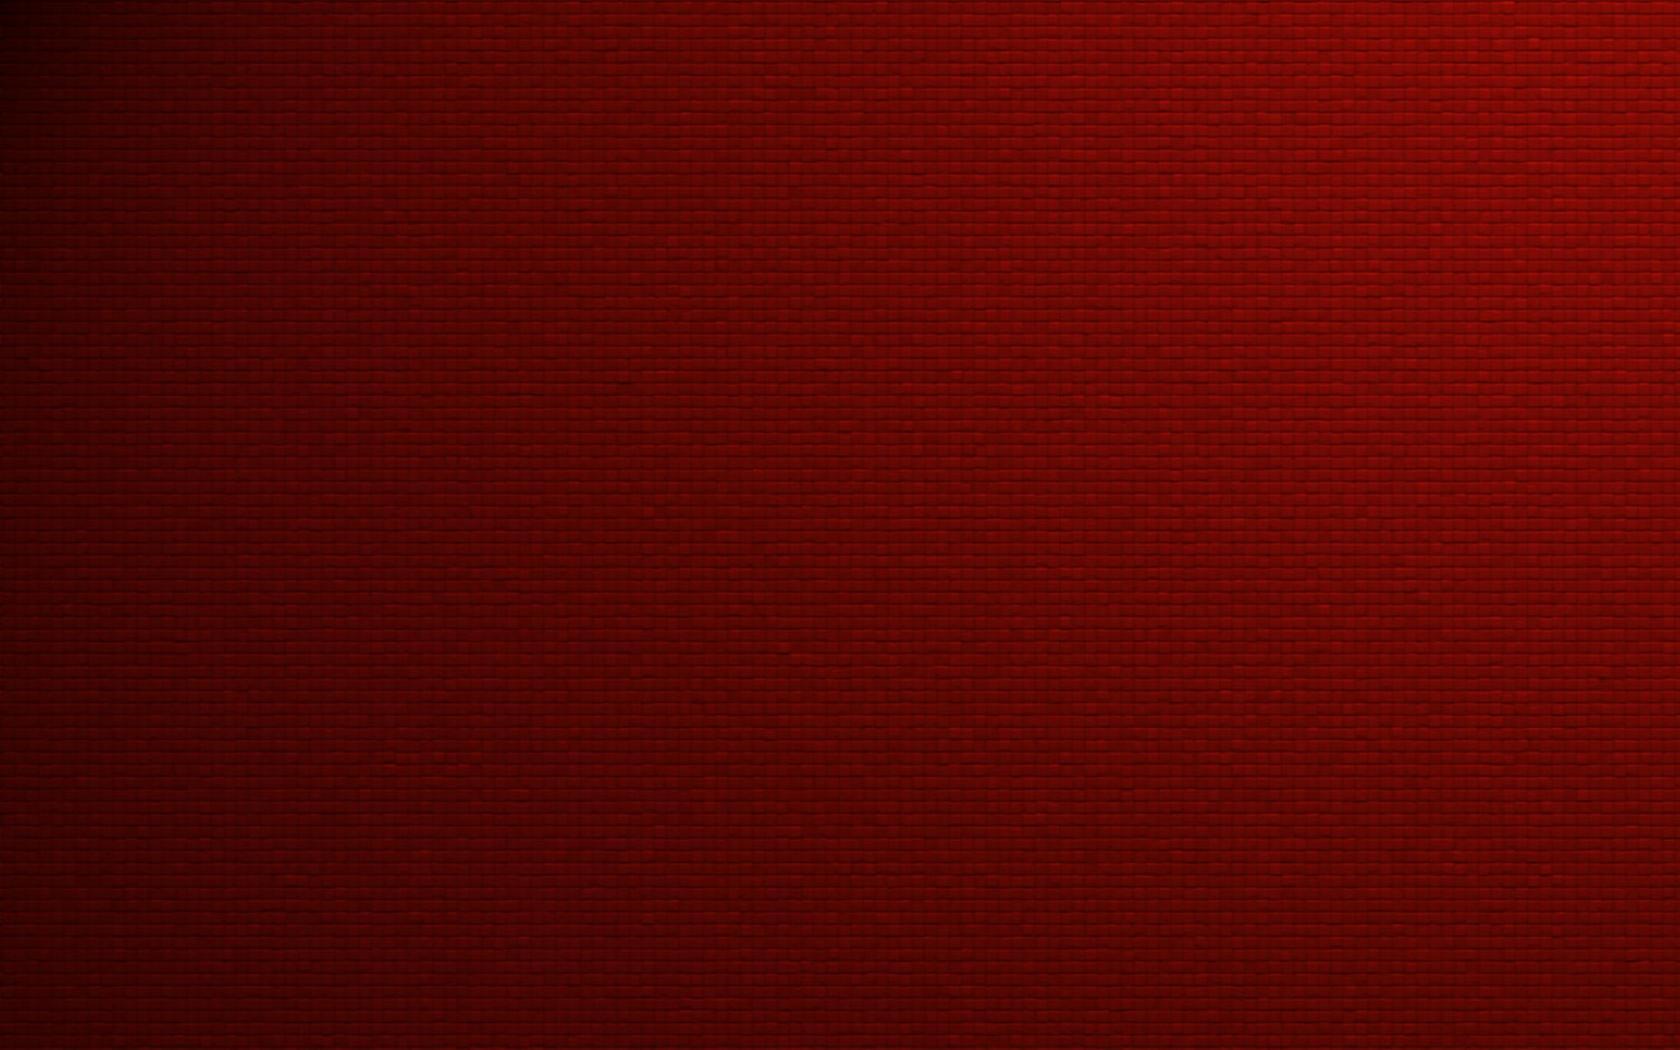 1680x1050 | Red Desktop Wallpaper | Abstract Red Wallpaper